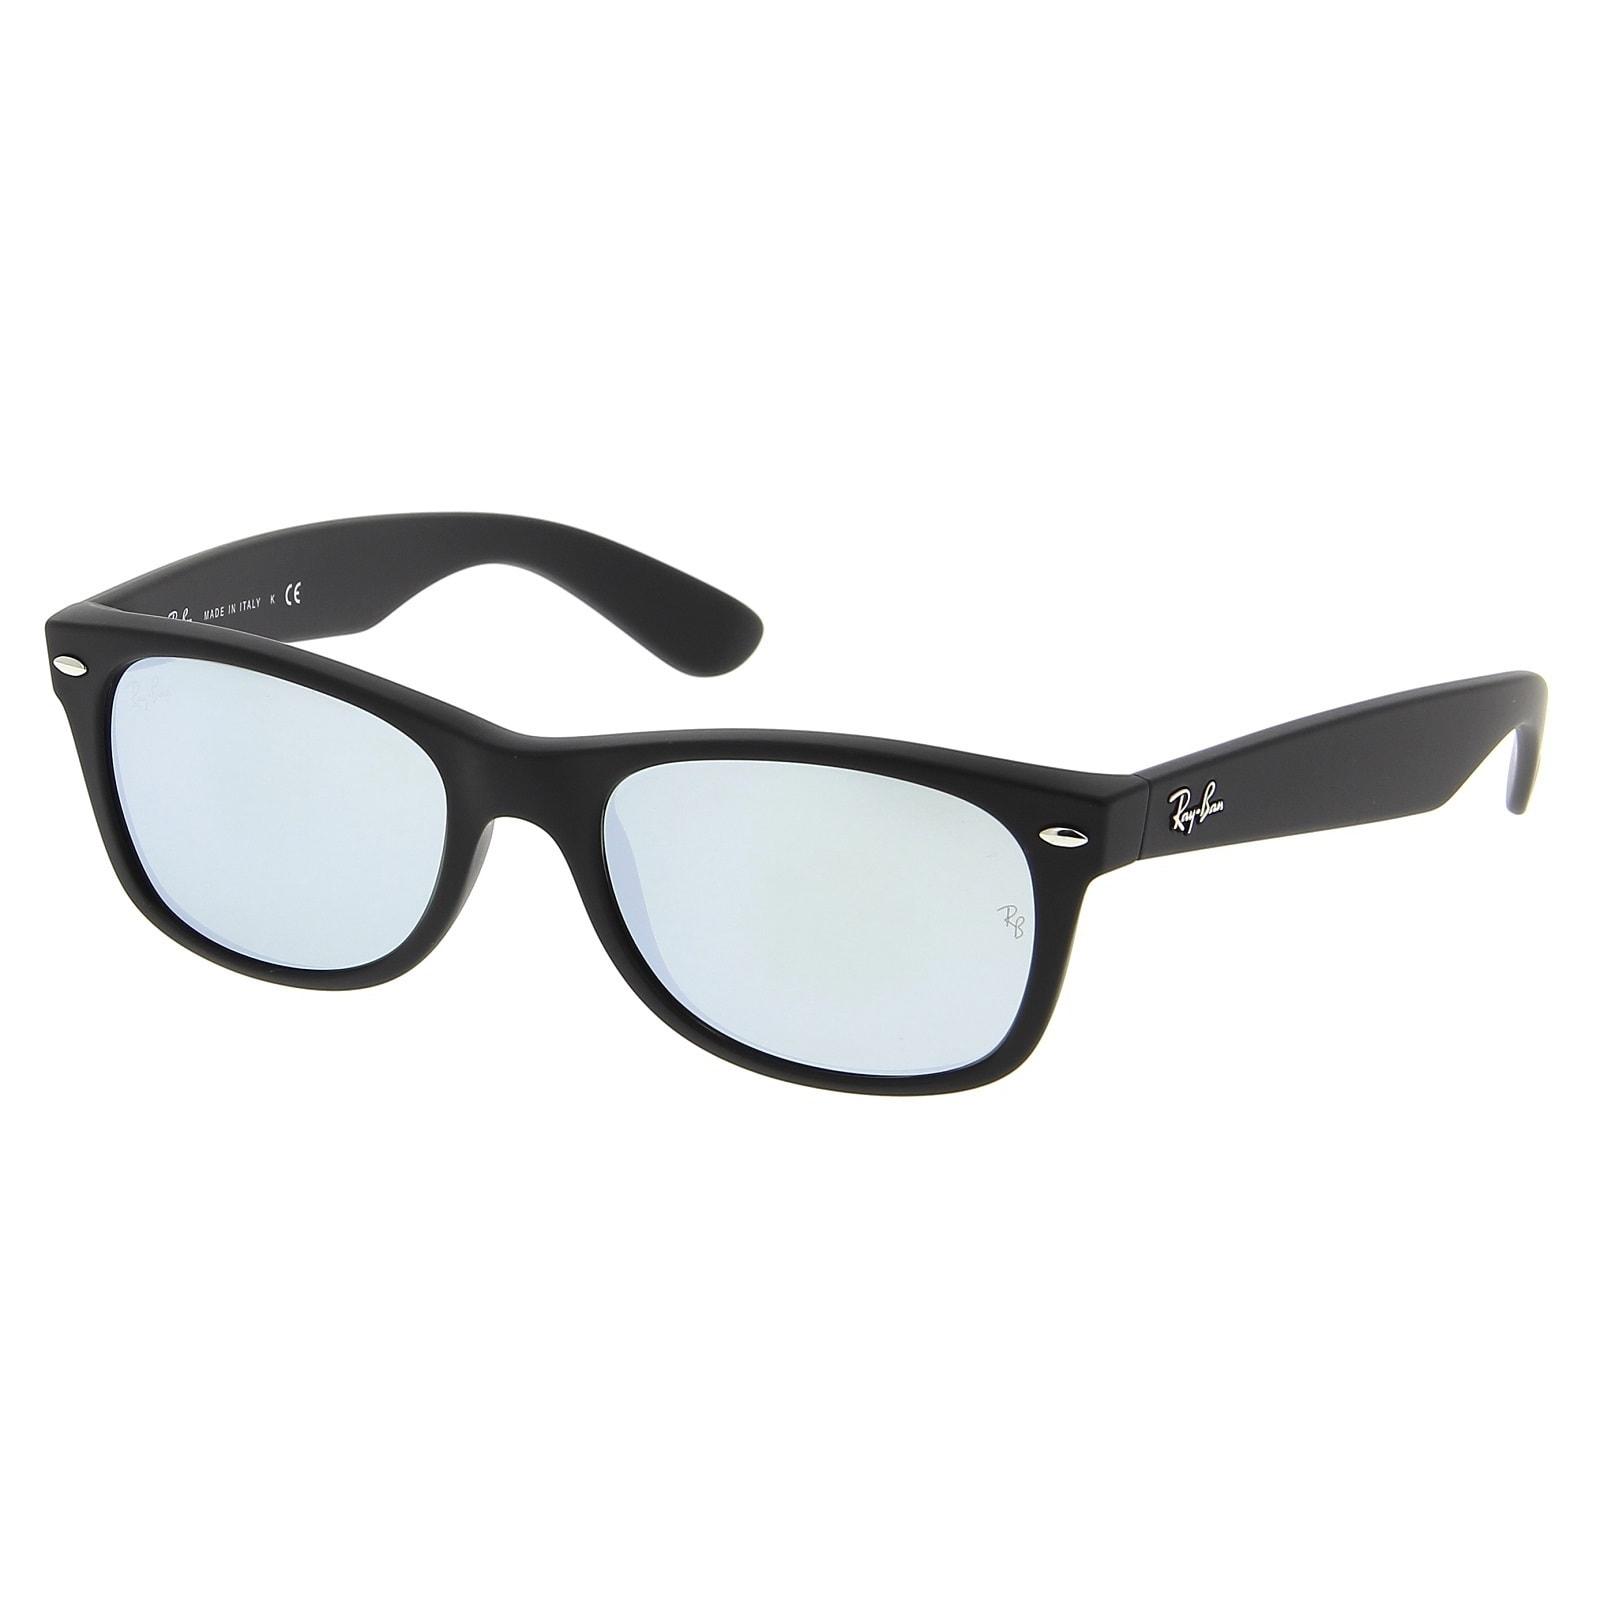 9d25dd9d93a Shop Ray-Ban New Wayfarer Flash RB2132 Unisex Matte Black Frame Silver  Flash 52mm Lens Sunglasses - Free Shipping Today - Overstock - 15310789